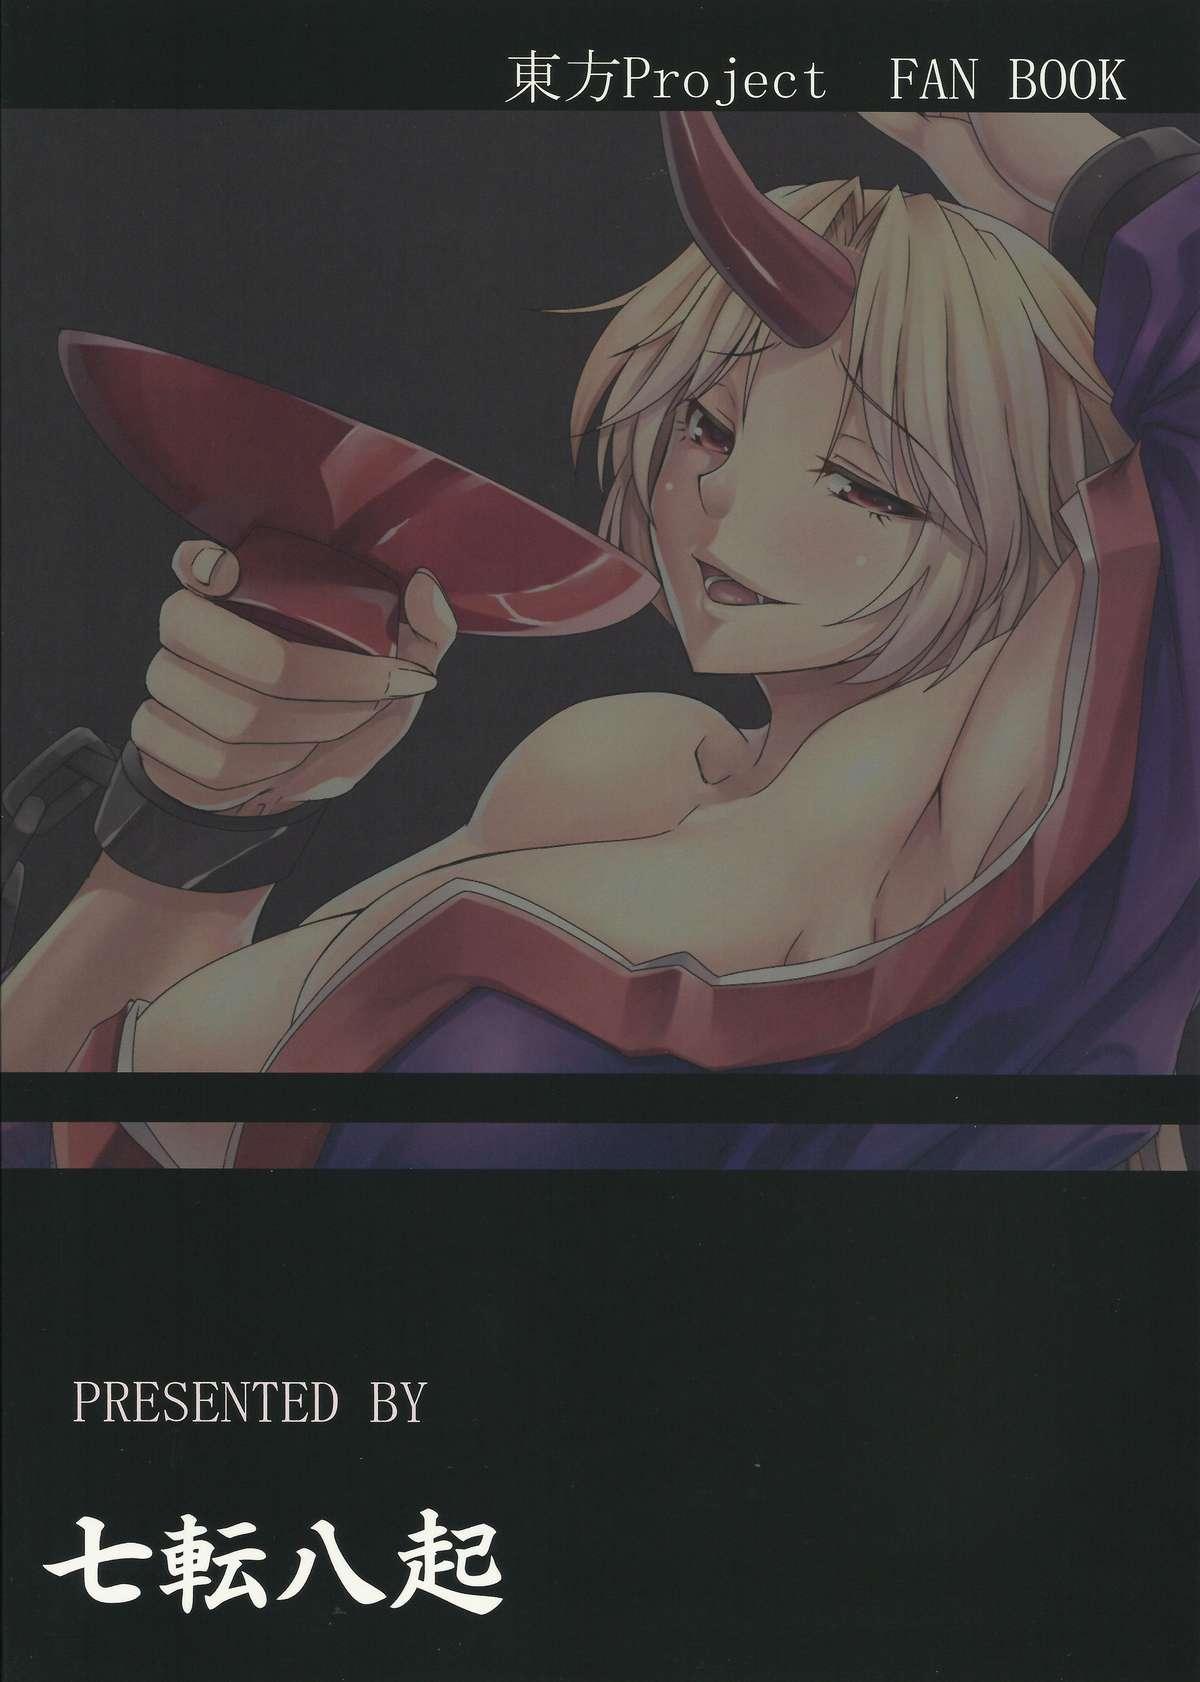 (Reitaisai 11) [Nanakorobi Yaoki (kinntarou)] 3M-Kyuu no Yuugi Nee-san ga Osotte Kitazo! | Attack of the 3M-Class Yuugi! (Touhou Project) [English] {JUSTICE} 25